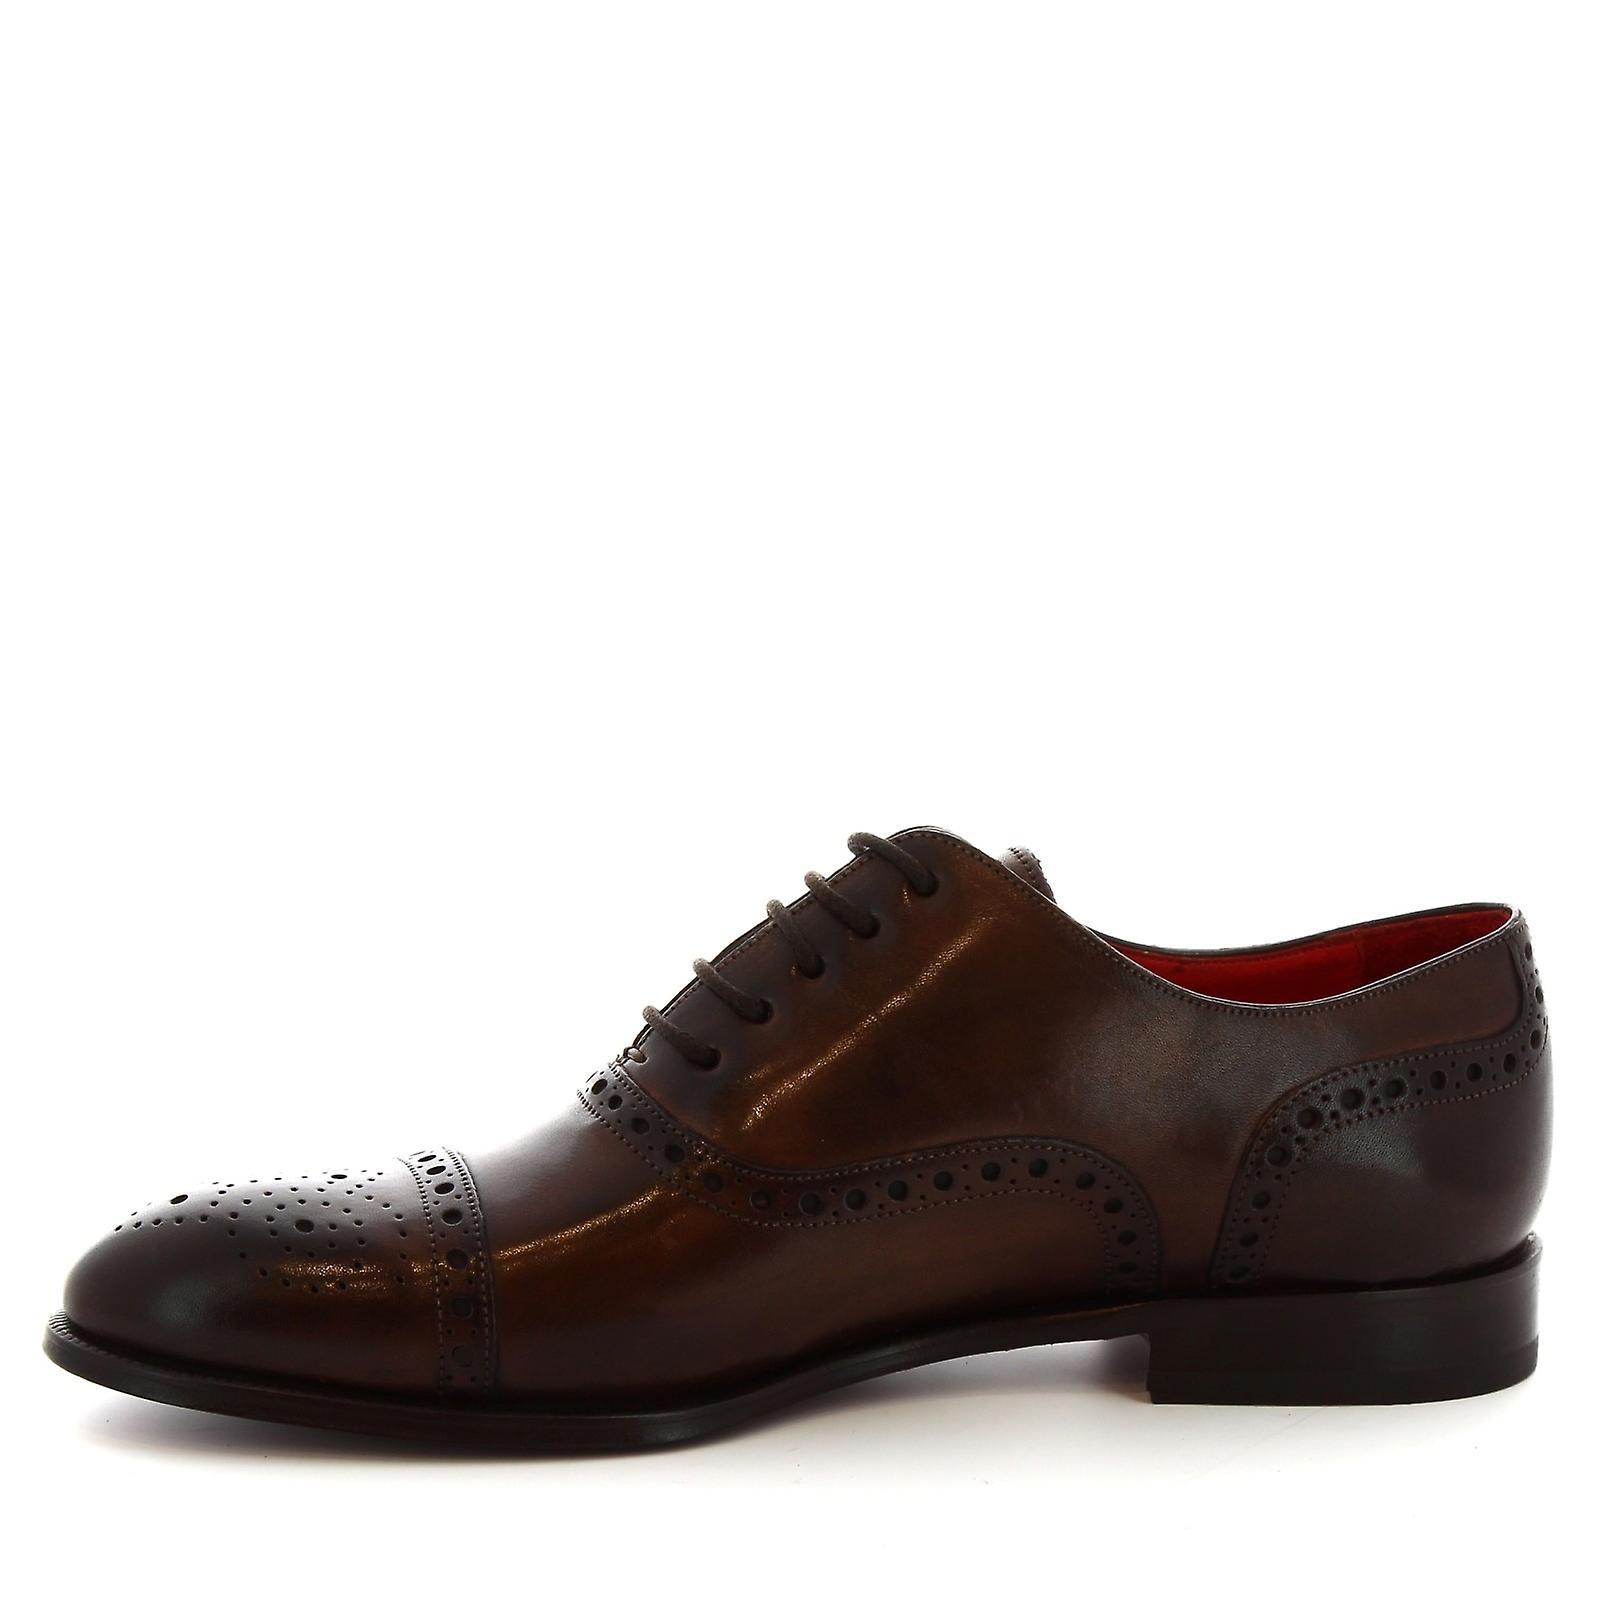 Leonardo Shoes 8636e19tomvitellodelavetmoro Men's Brown Leather Lace-up Shoes XZPf2b